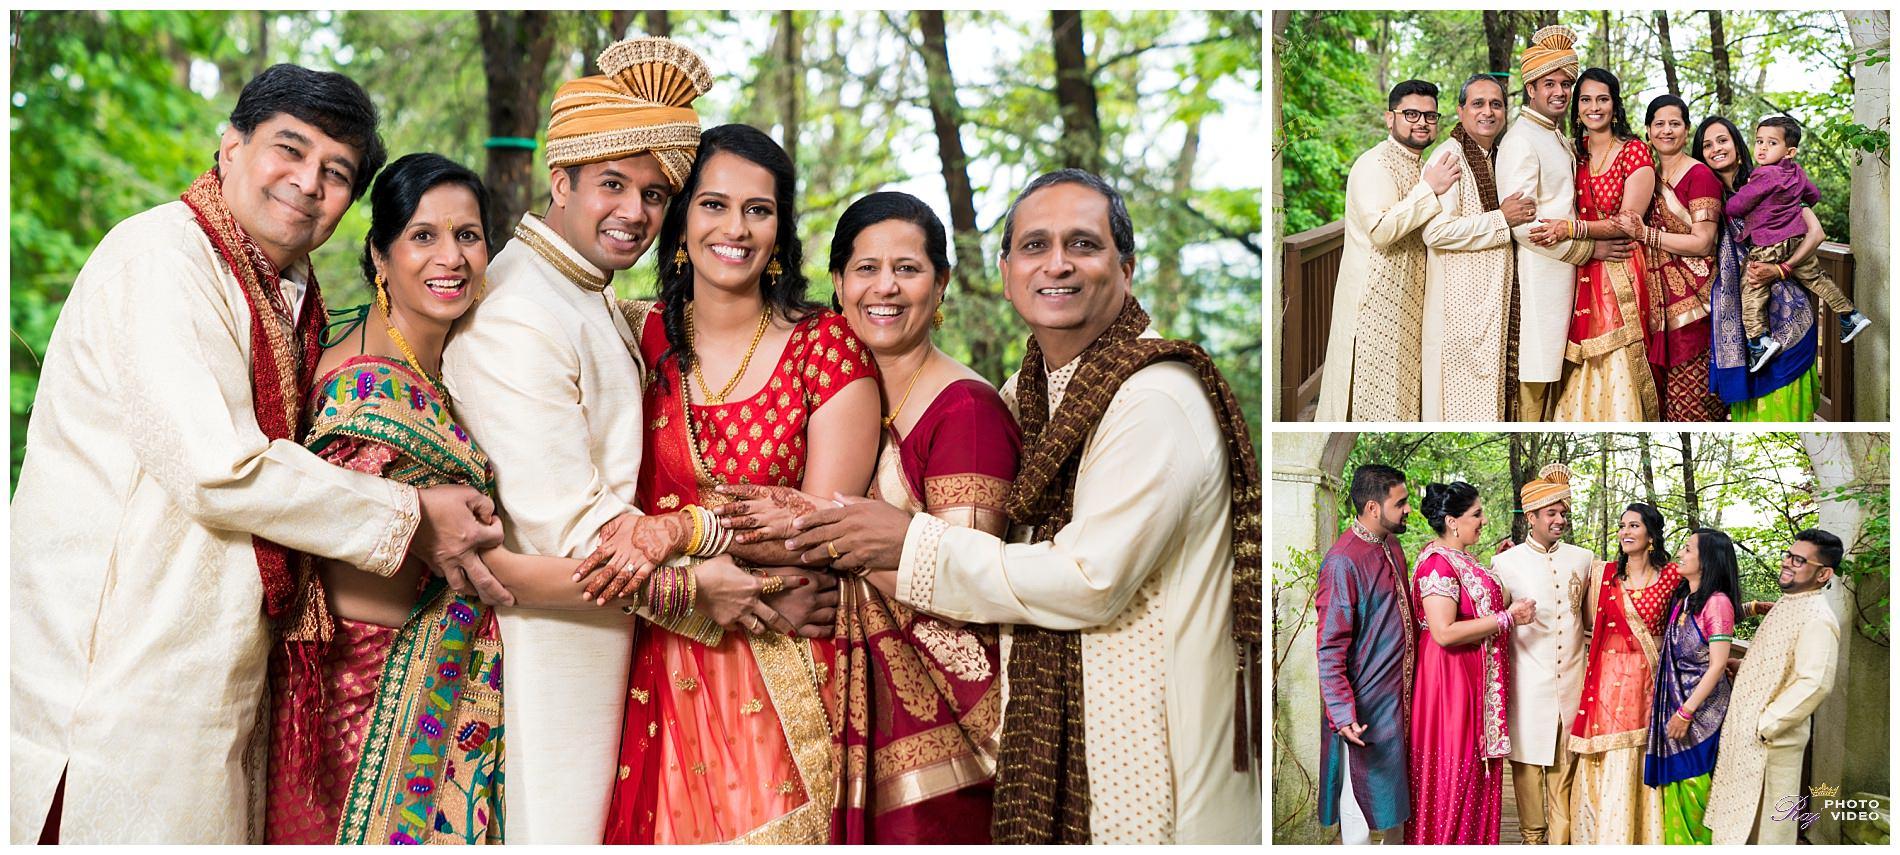 Martinsville-Gardens-NJ-Indian-Wedding-Ruchi-Vishal-14.jpg